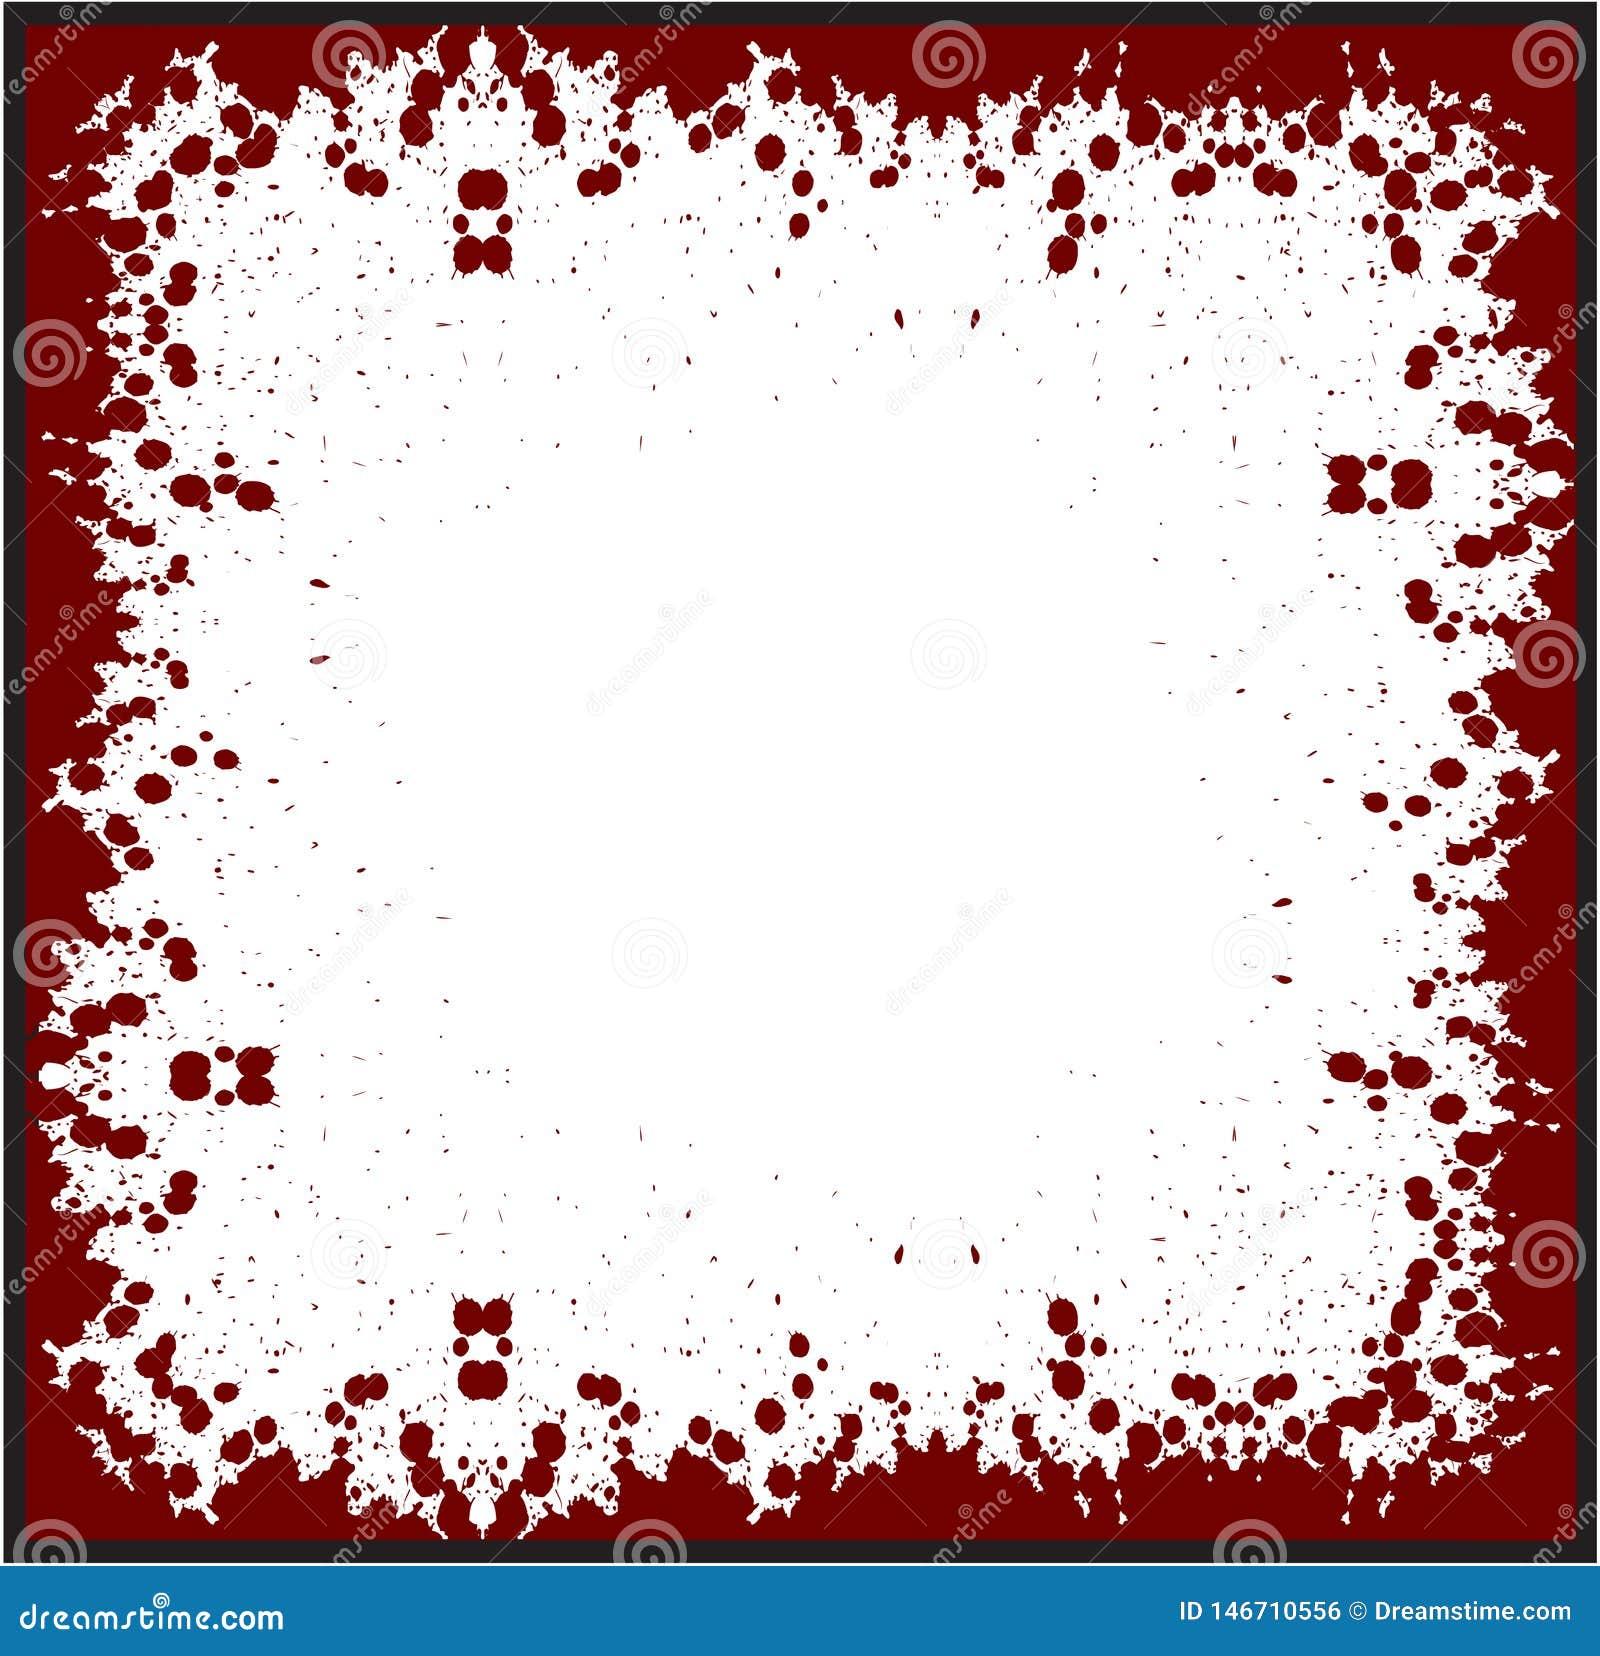 Blood red blooddrop血淋淋的难看的东西